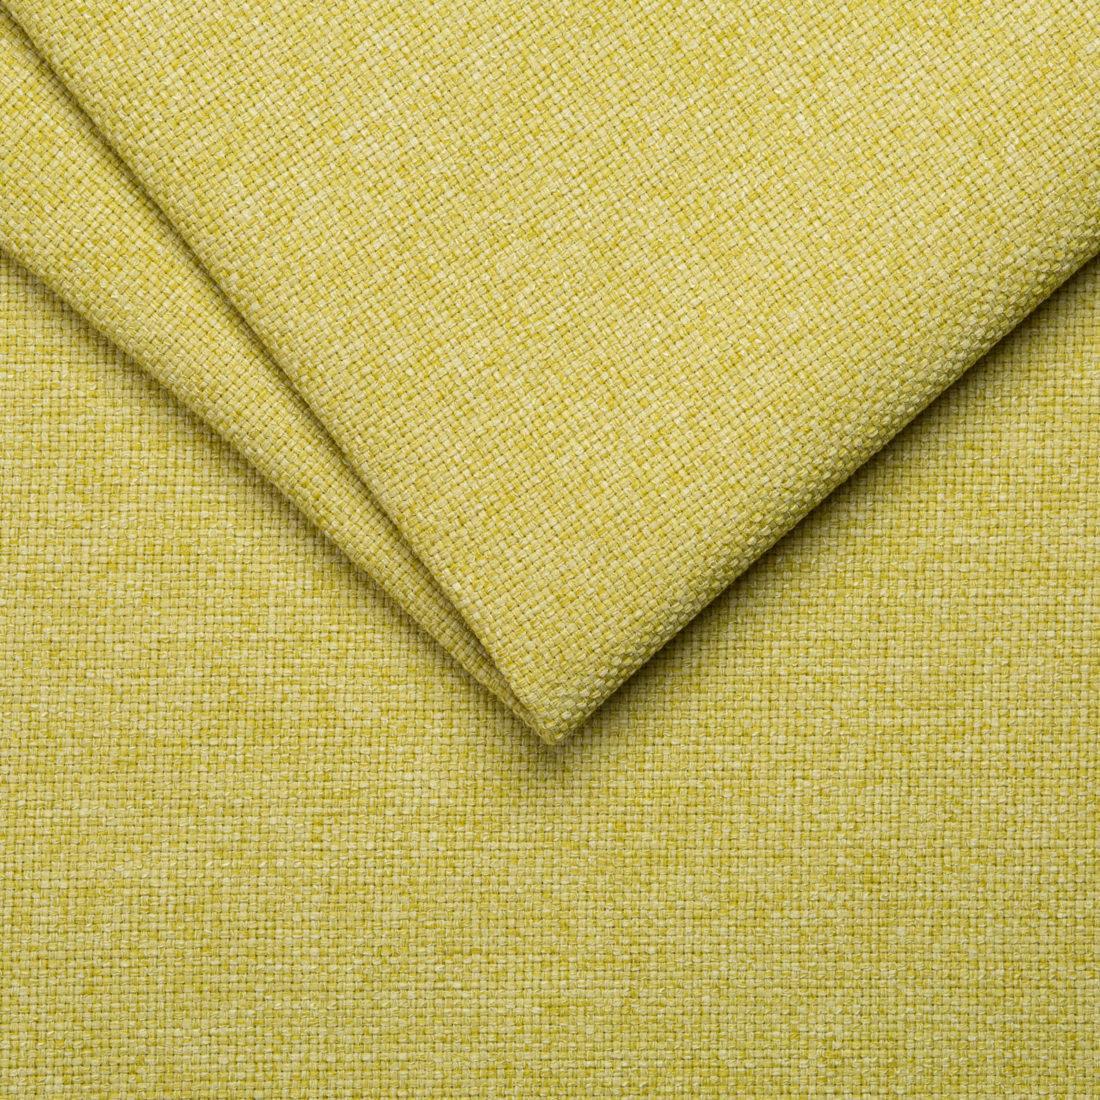 Меблева тканина Jazz 9 Lemon, рогожка